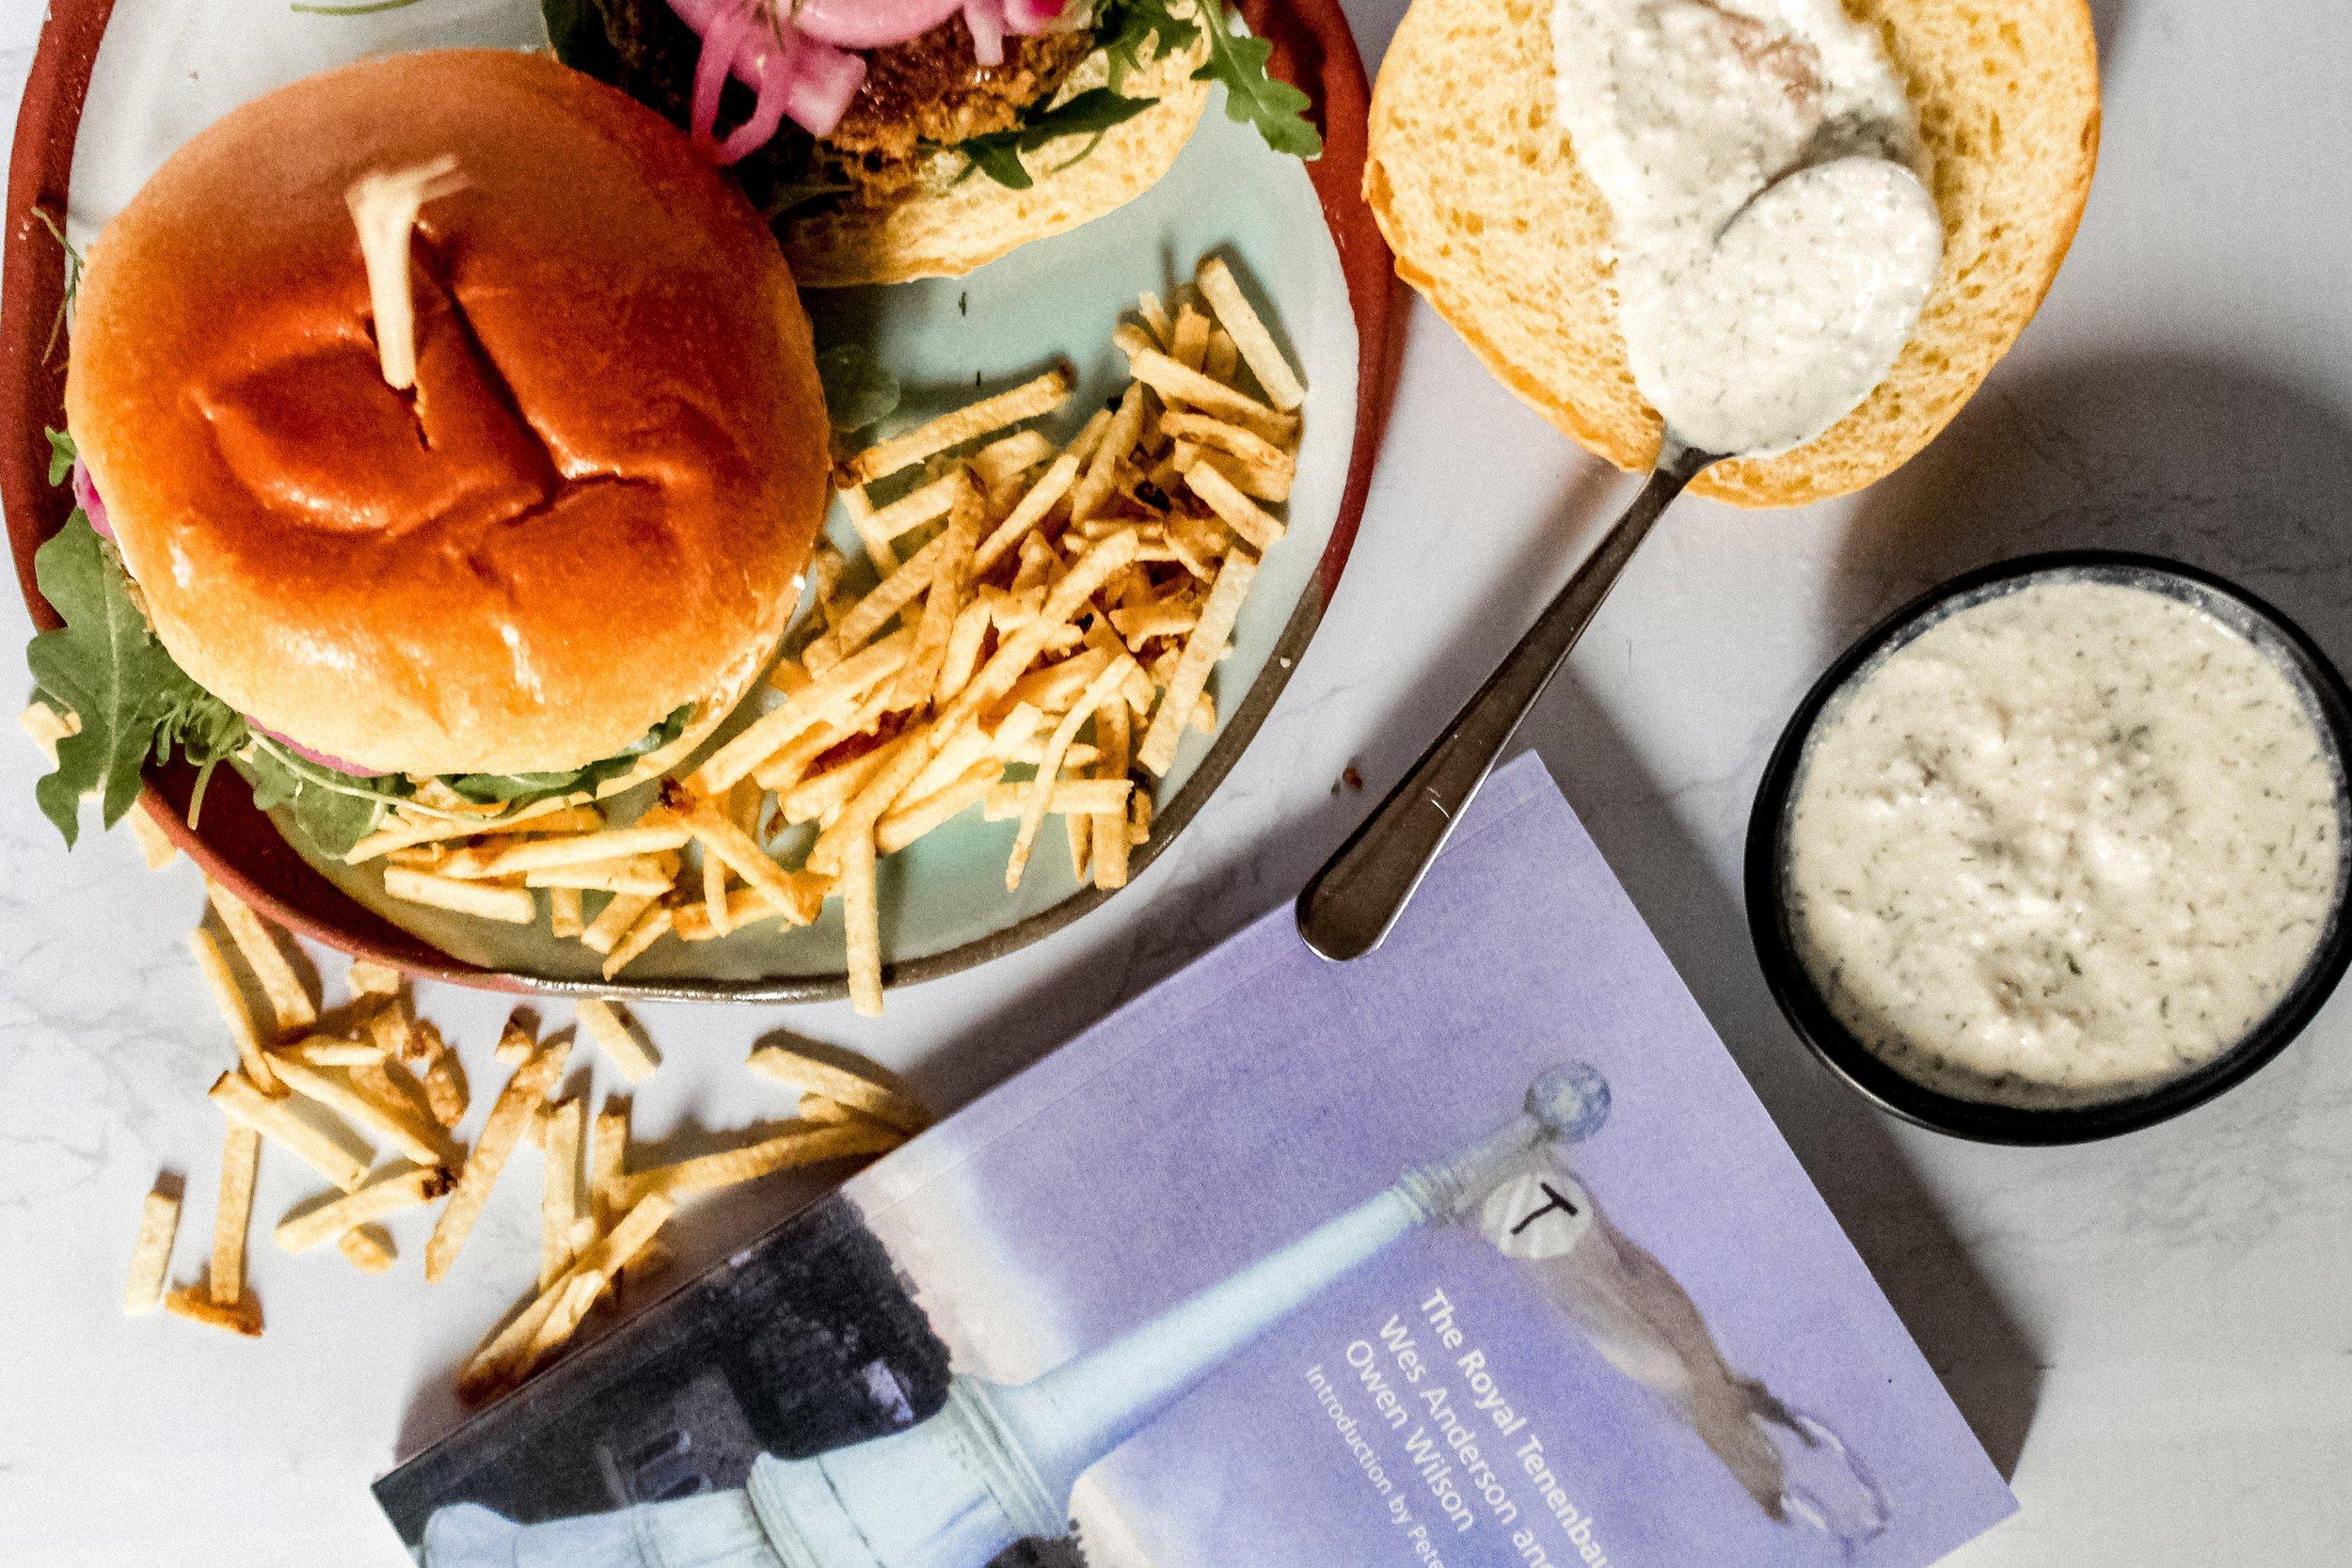 Veggie Burgers and The Royal Tenenbaums